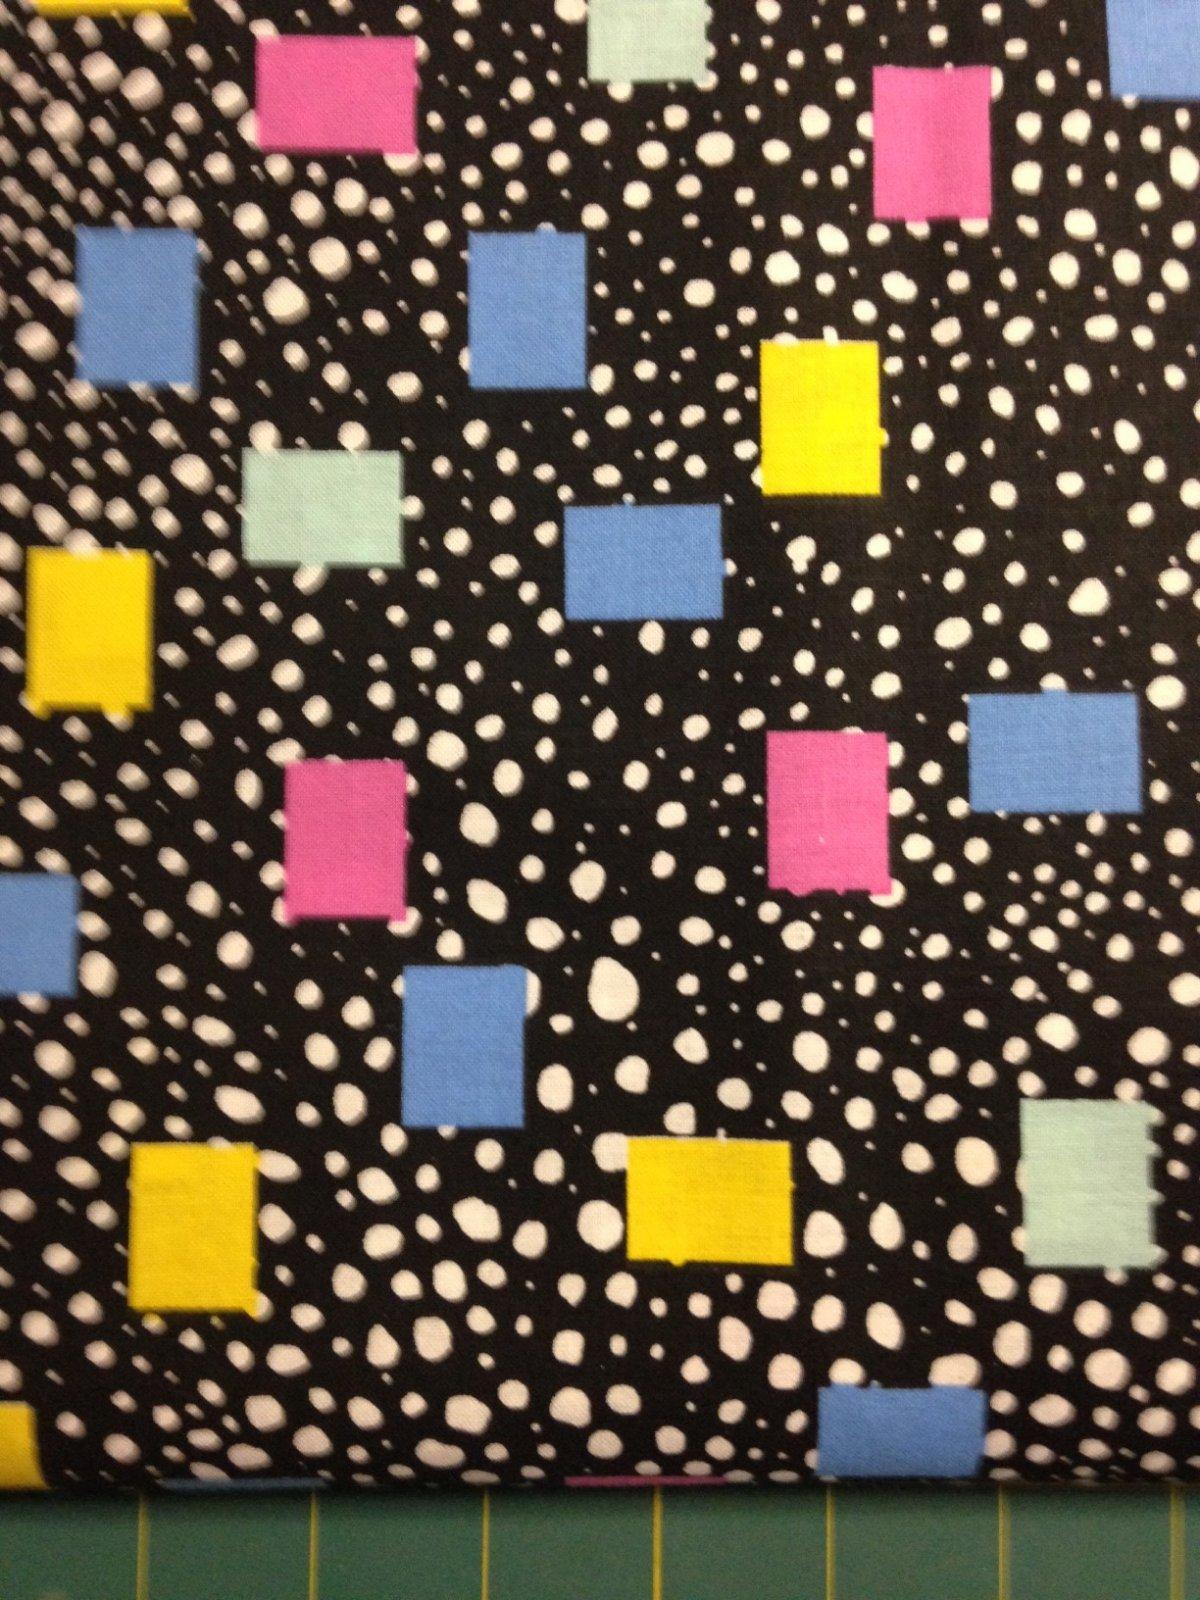 All That Jazz  Mixed Medley Dots Squares